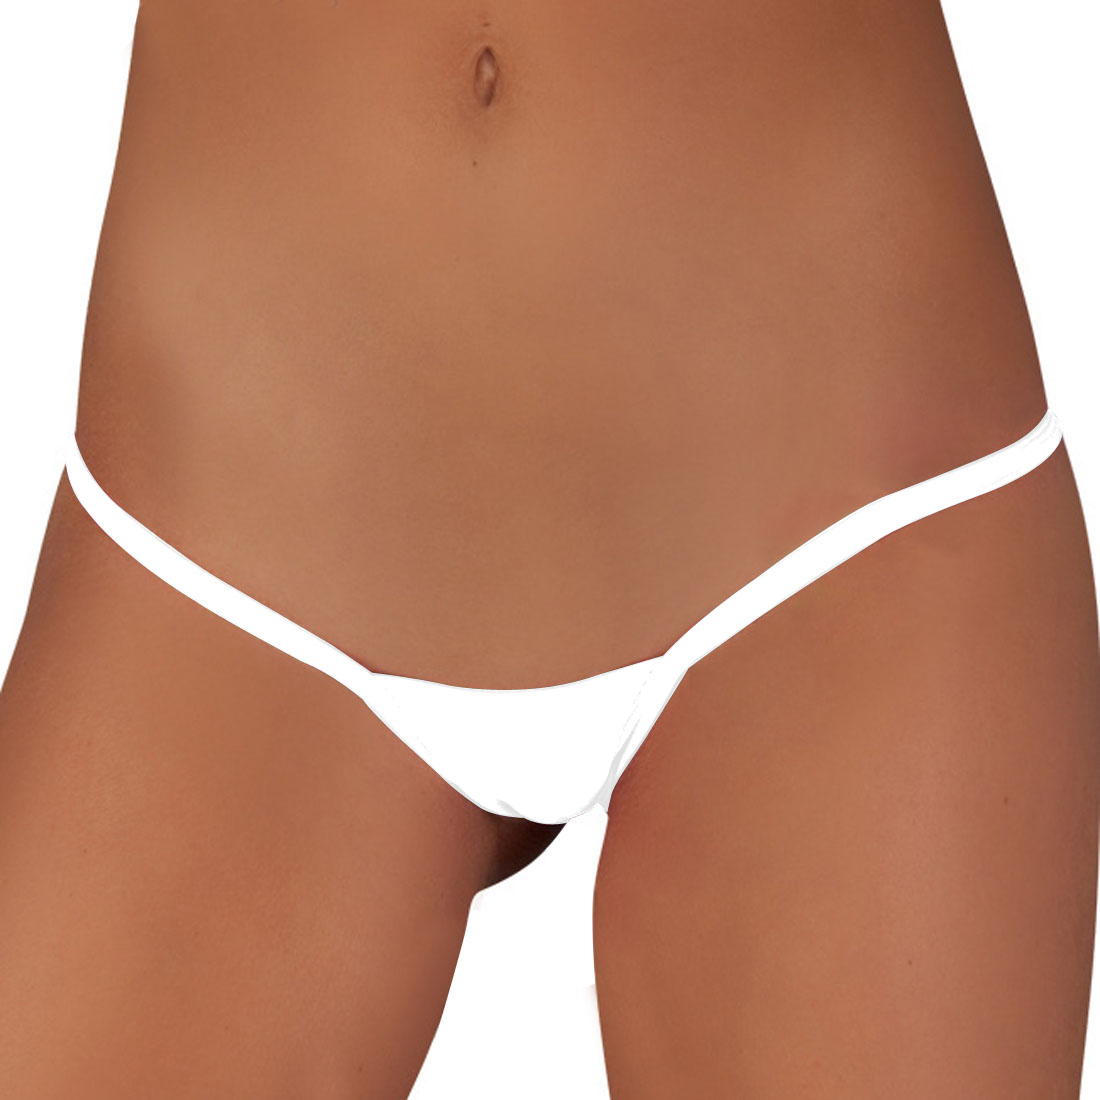 Hot Panties Pictures 34